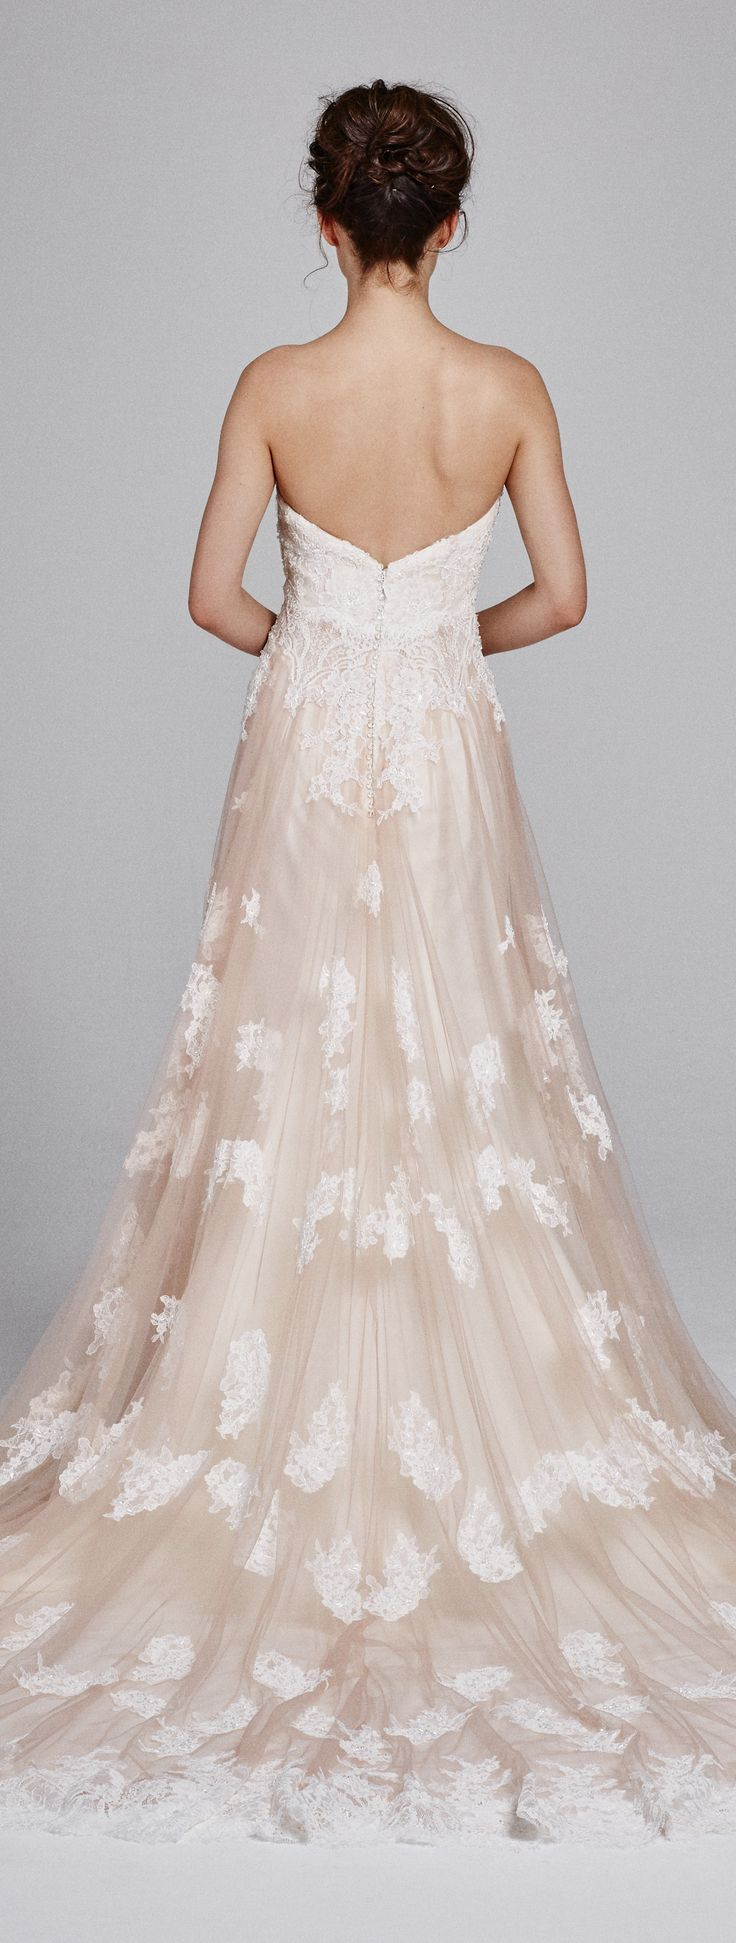 Blush lace wedding dress by Kelly Faetanini Fall 2017